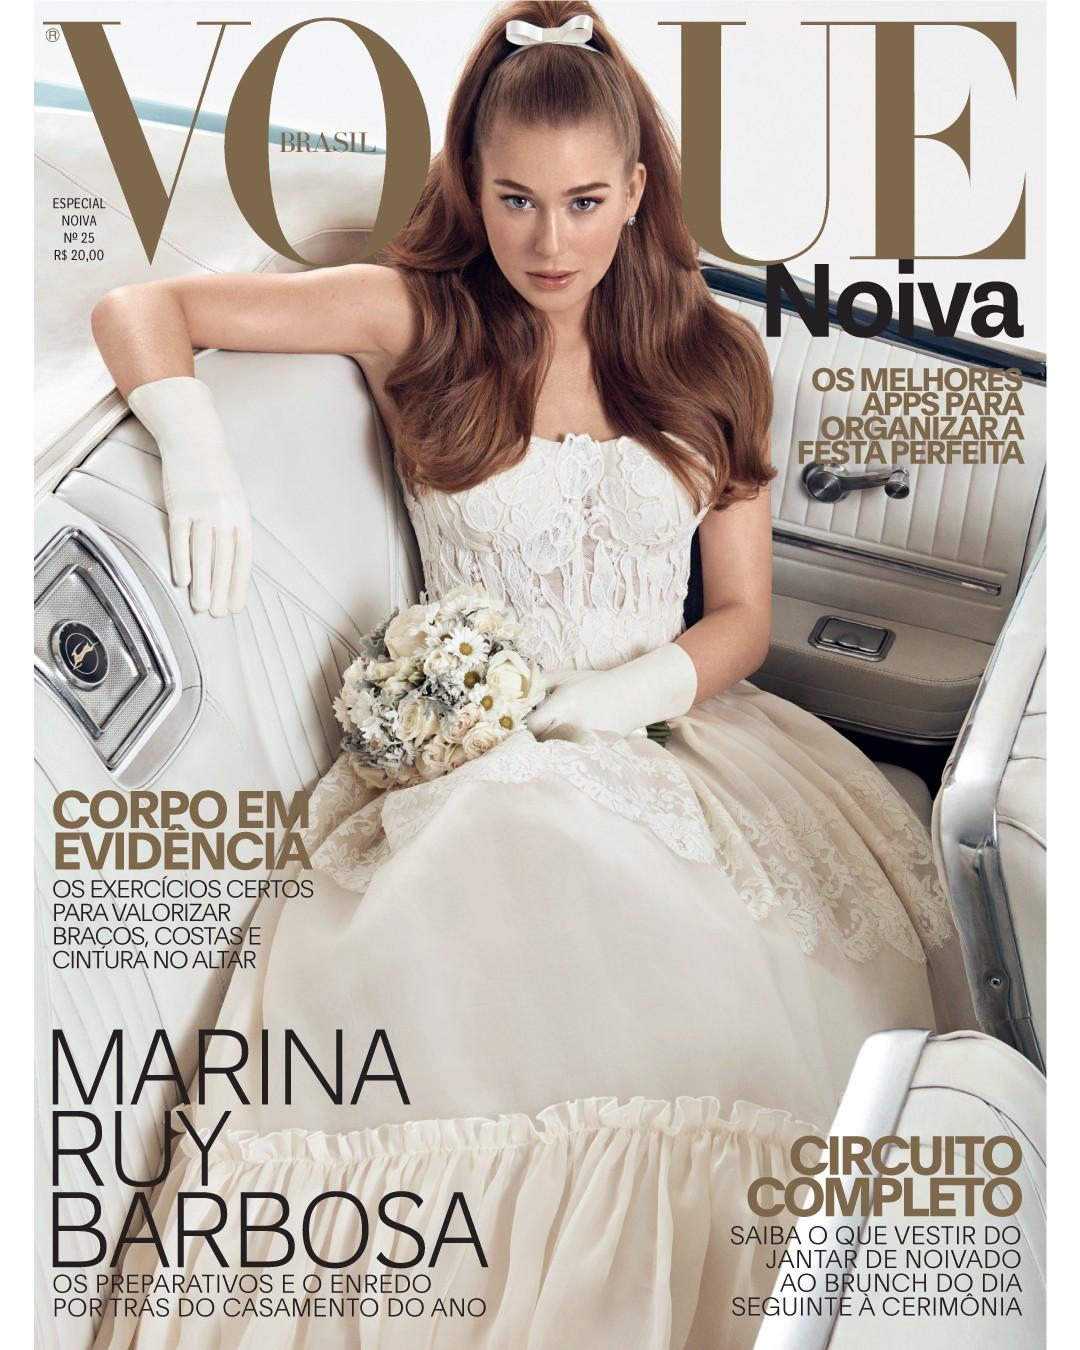 Marina Ruy Barbosa usa vestido Dolce & Gabbana, luvas B.Luxo e buquê Florinda (Foto: Gil Inoue. Styling: Alexandra Benenti e beleza de Silvio Giorgio)